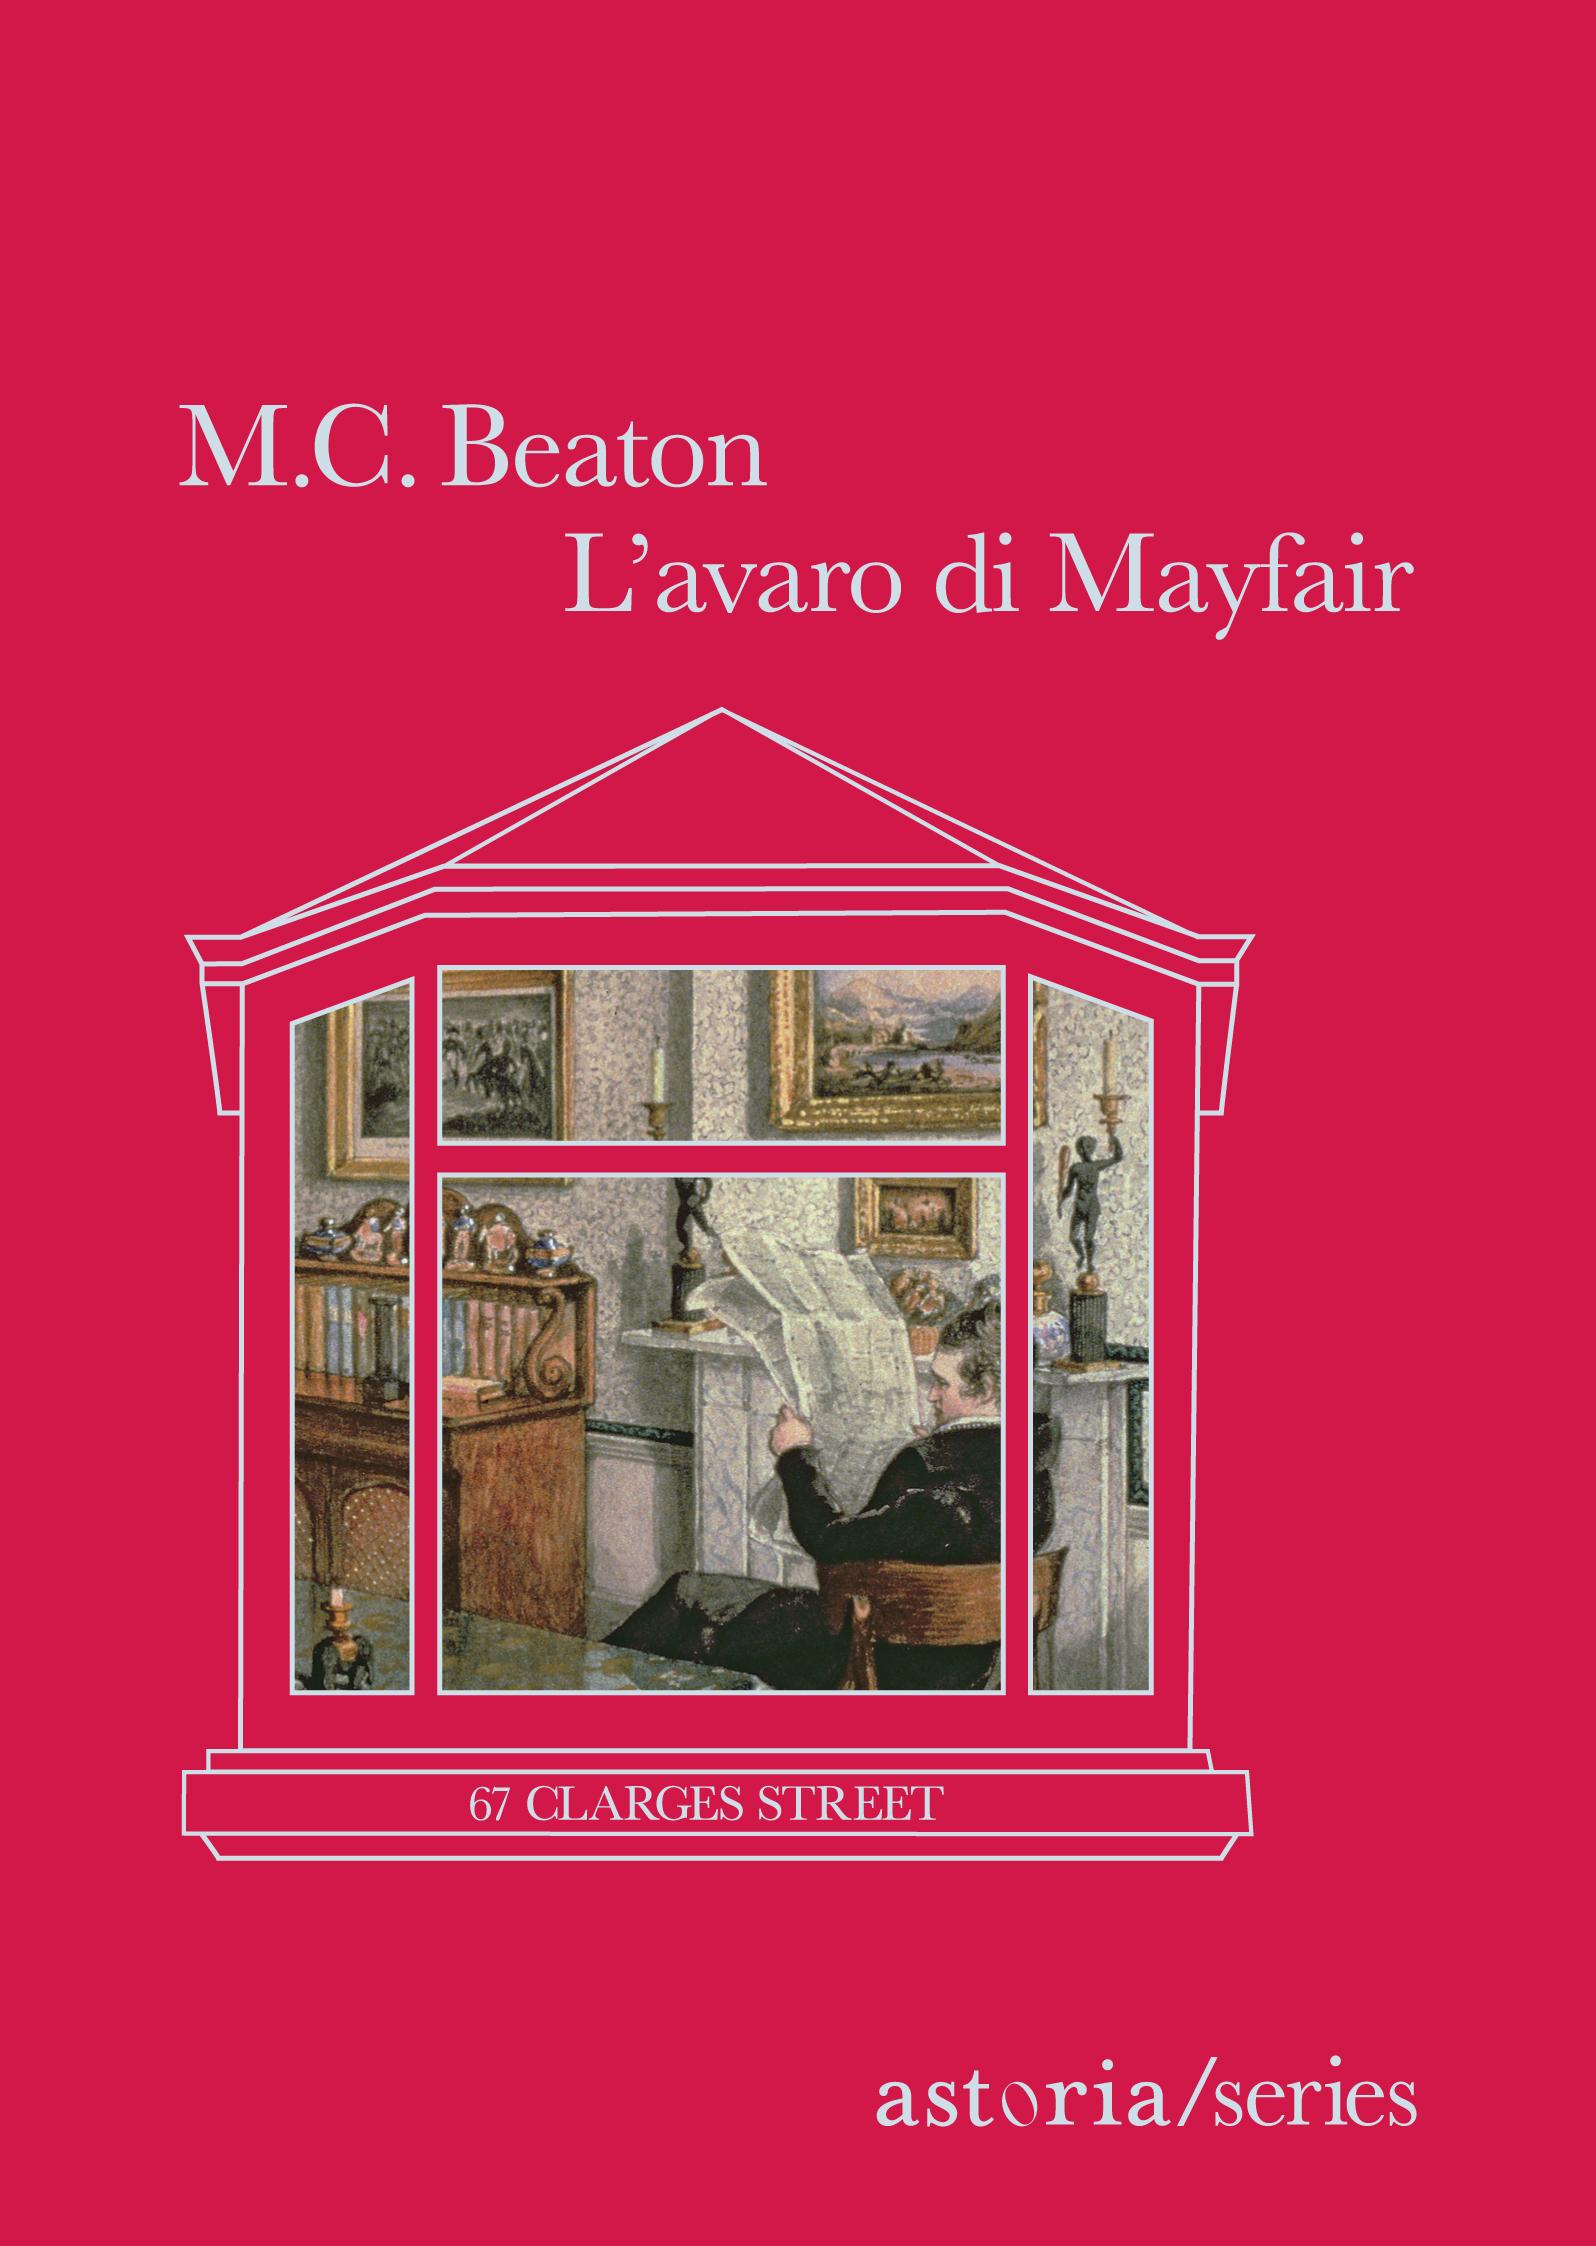 M. C. Beaton L'avaro di Mayfair 67 Clarges Street